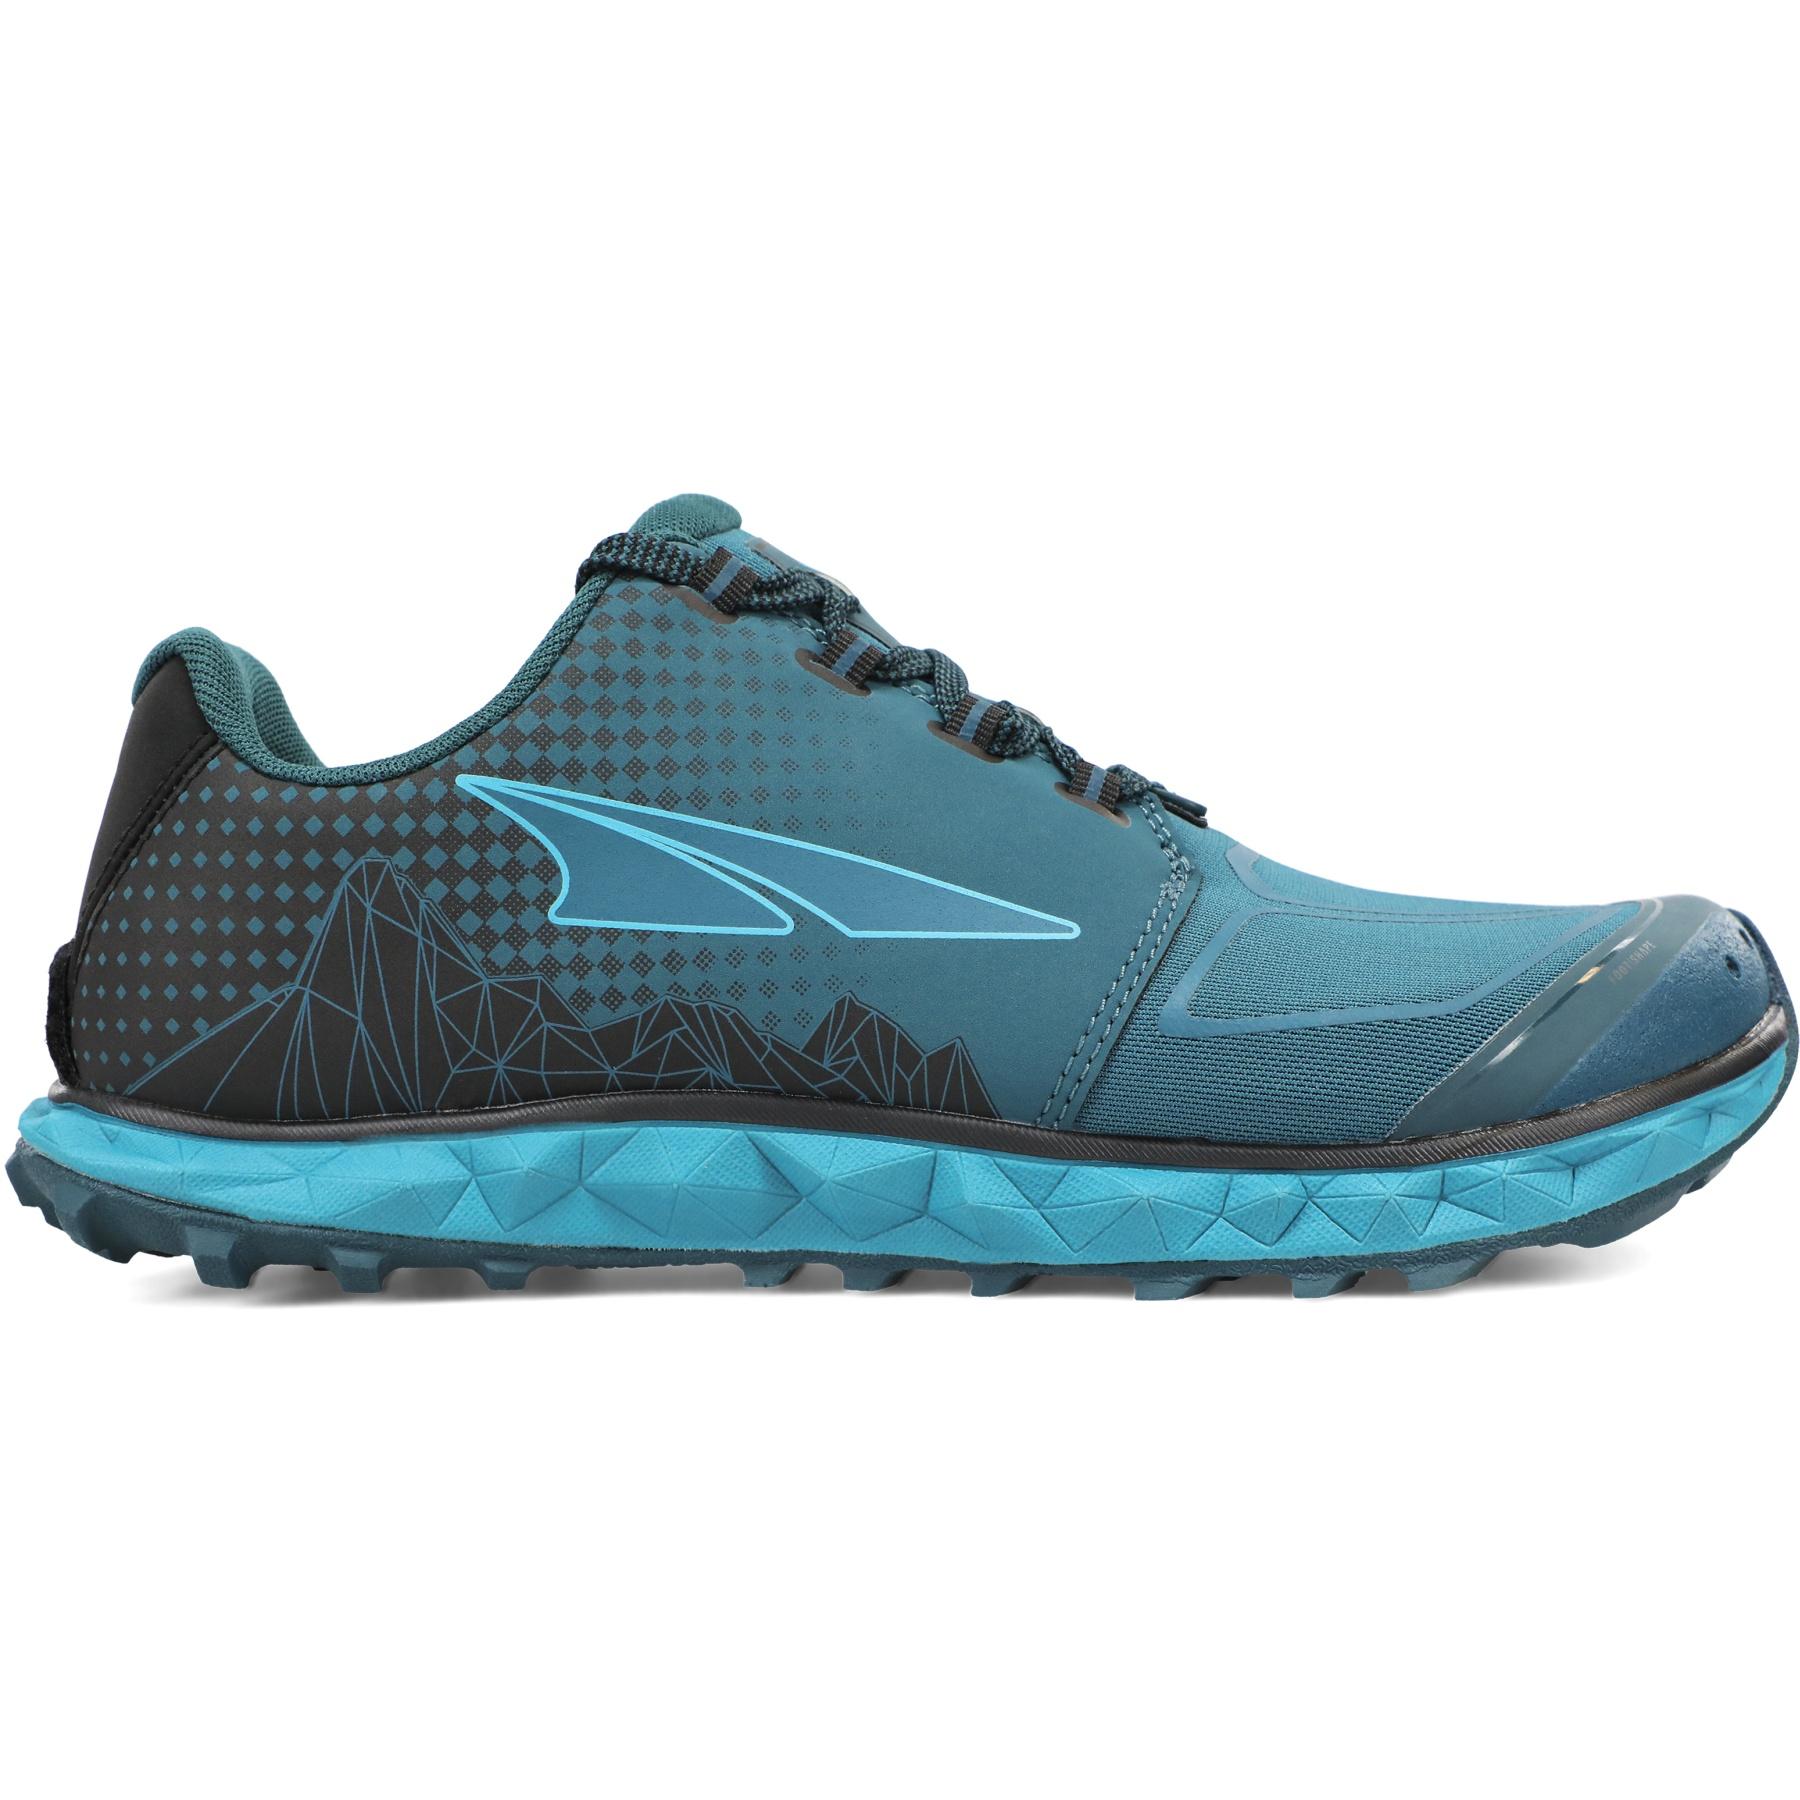 Altra Superior 4.5 Trail Running Shoes Women - Capri Breeze